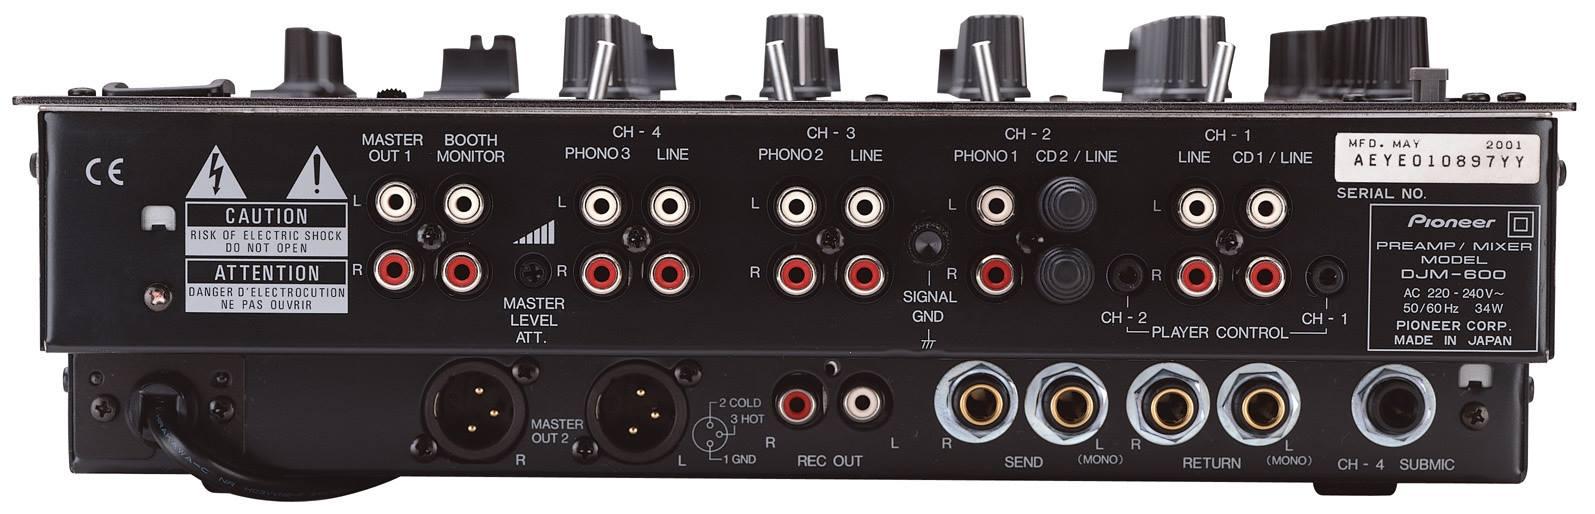 03. Pioneer DJM-600